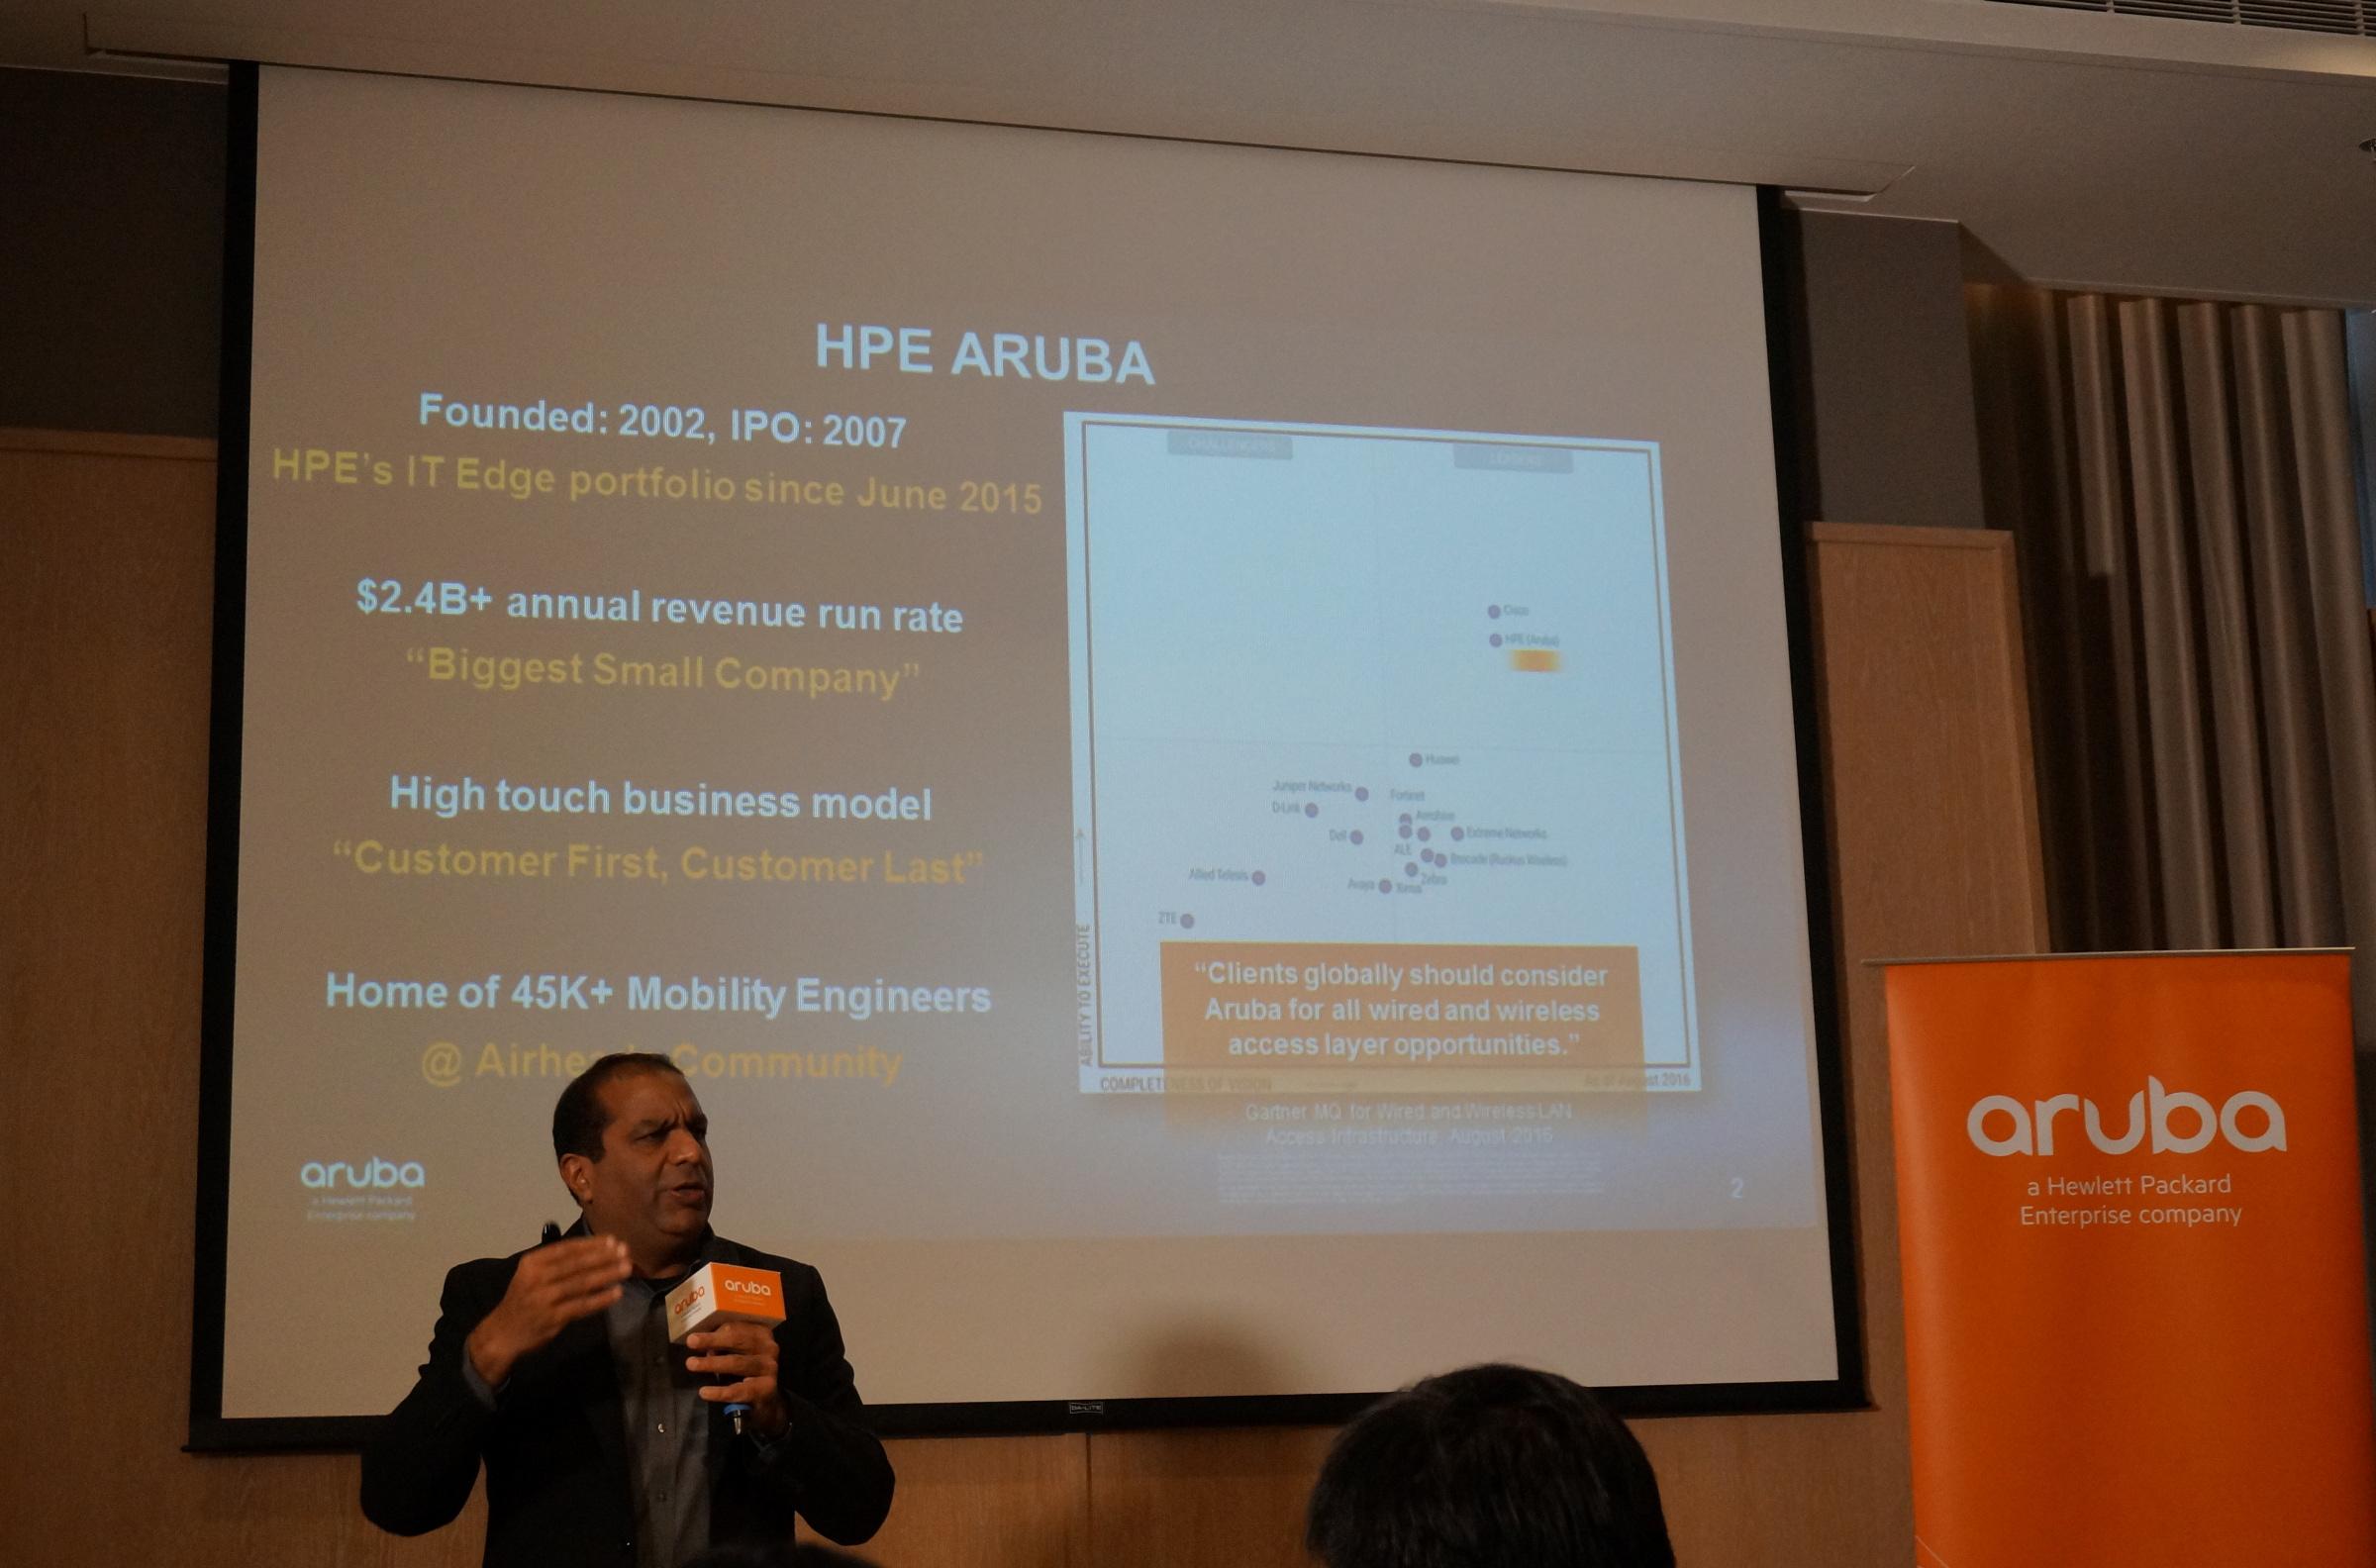 HPE-Aruba-history2017